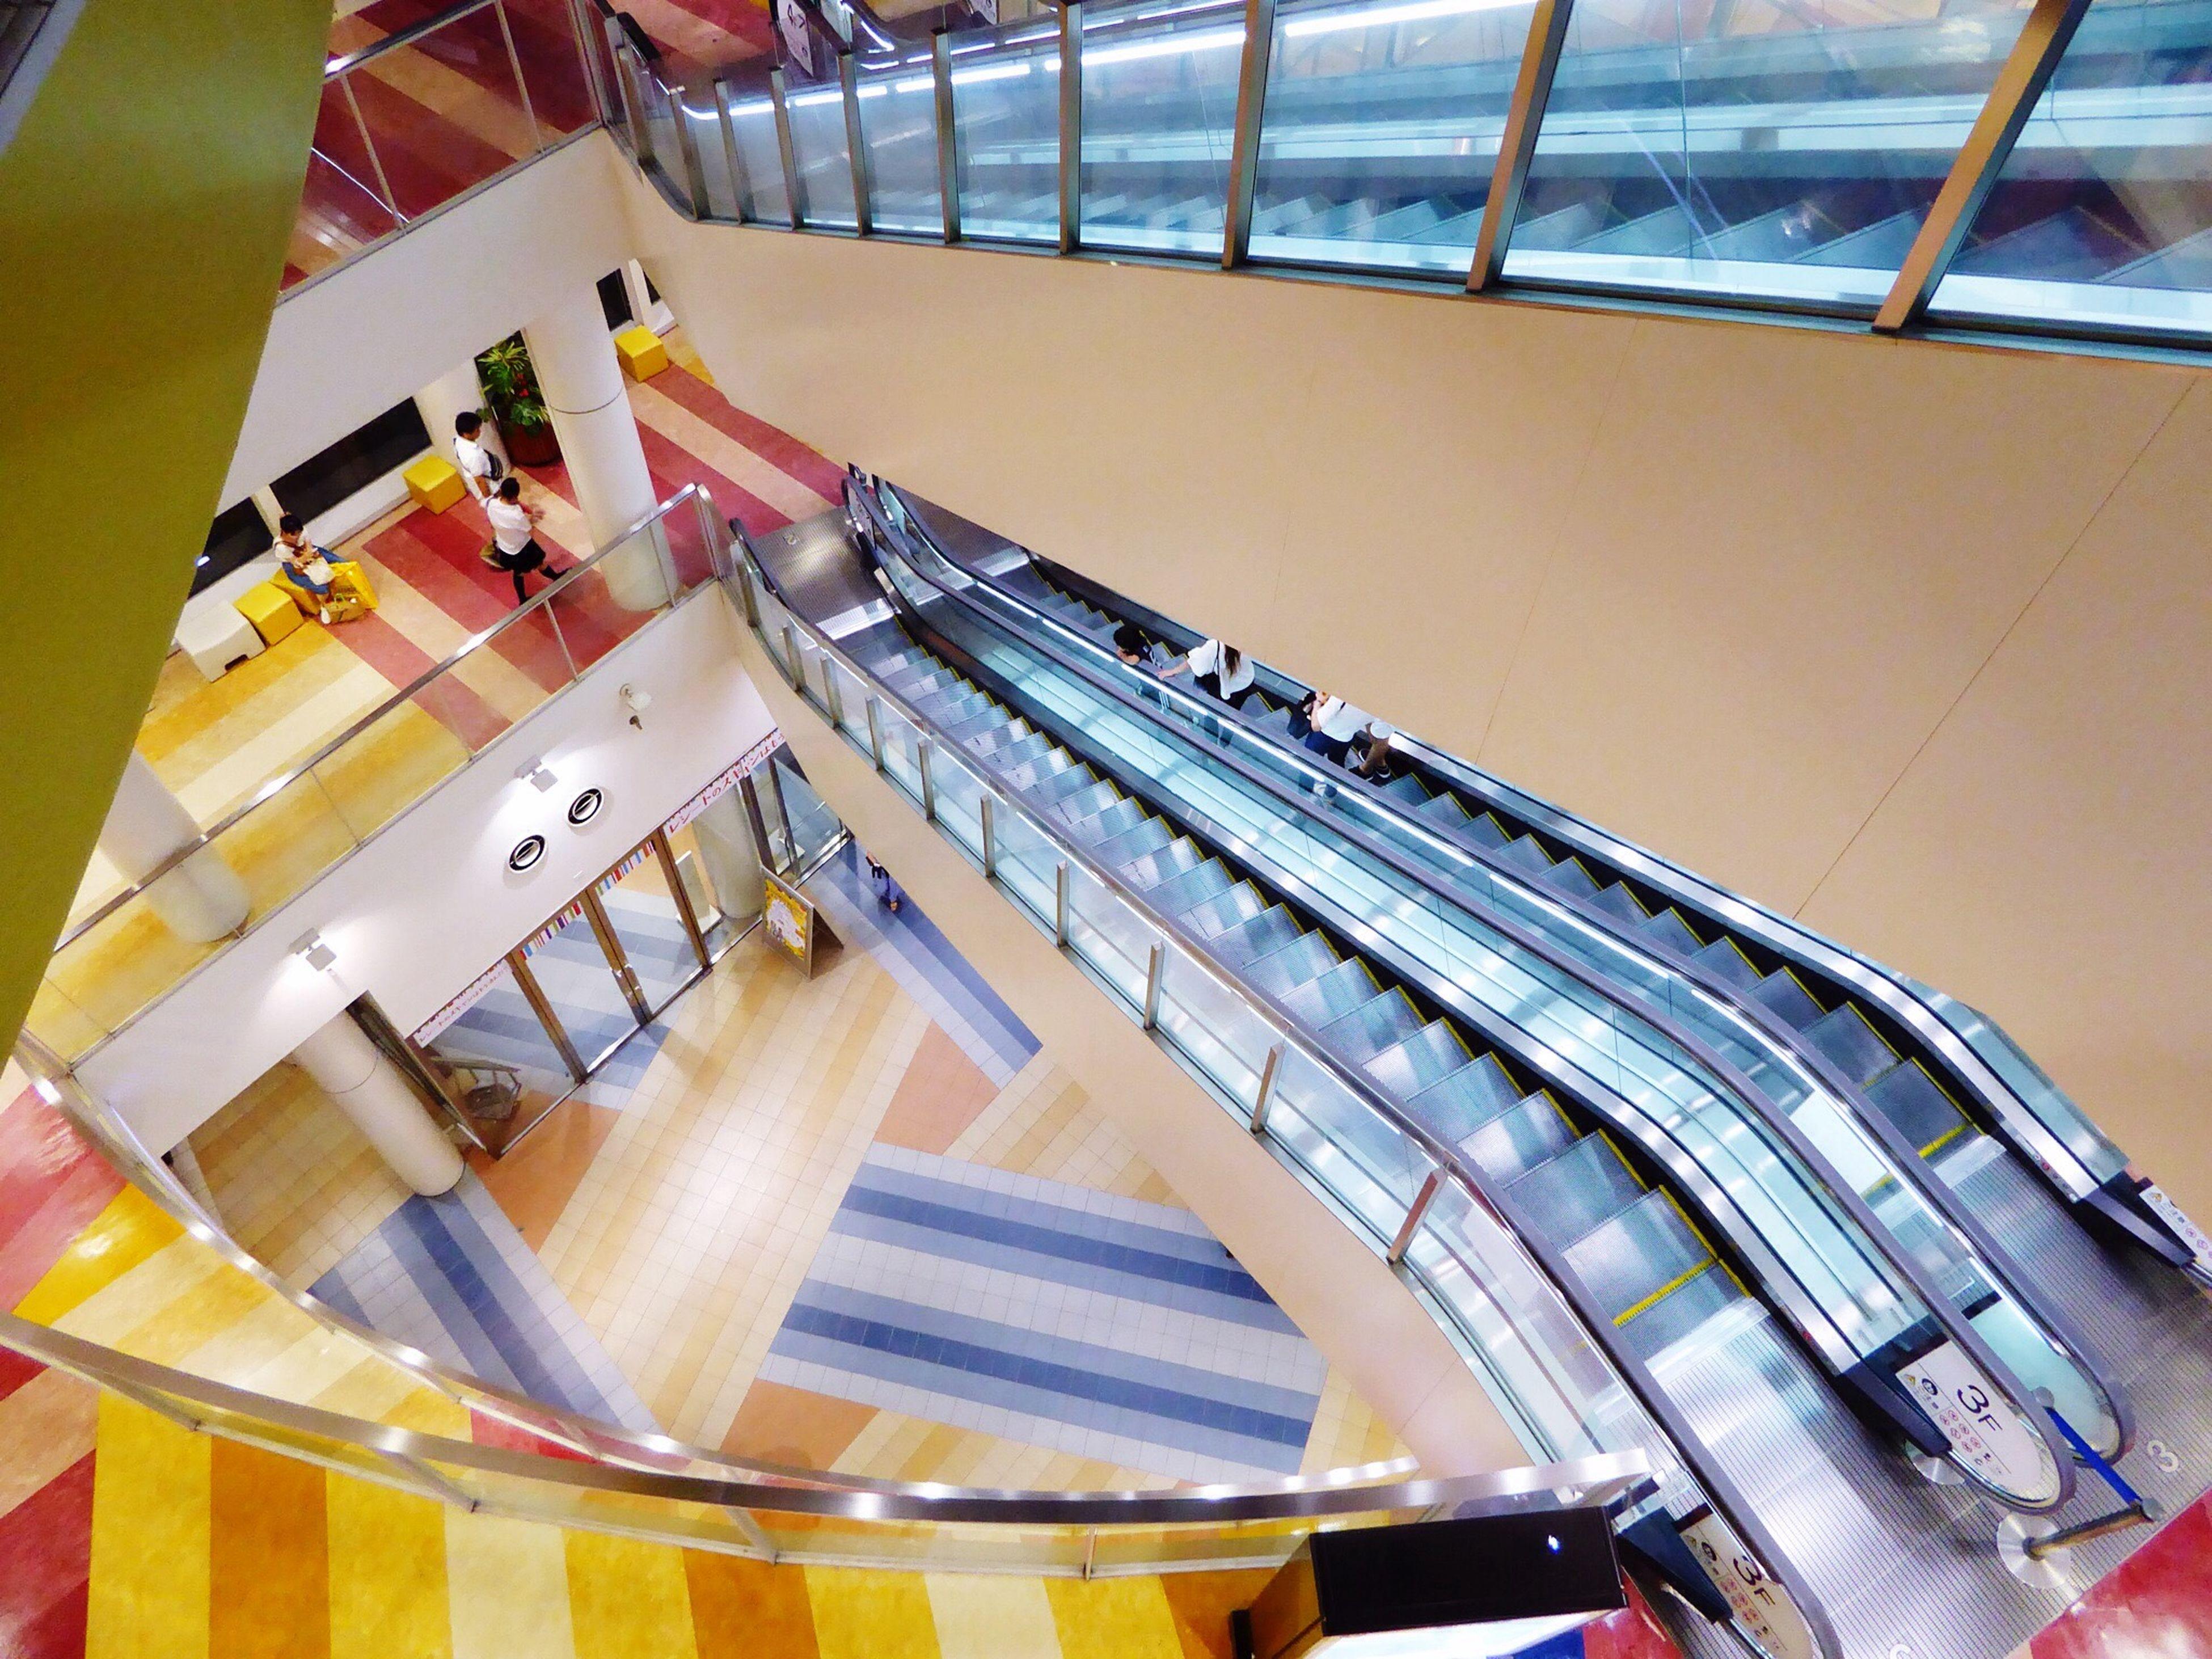 indoors, railing, day, retail